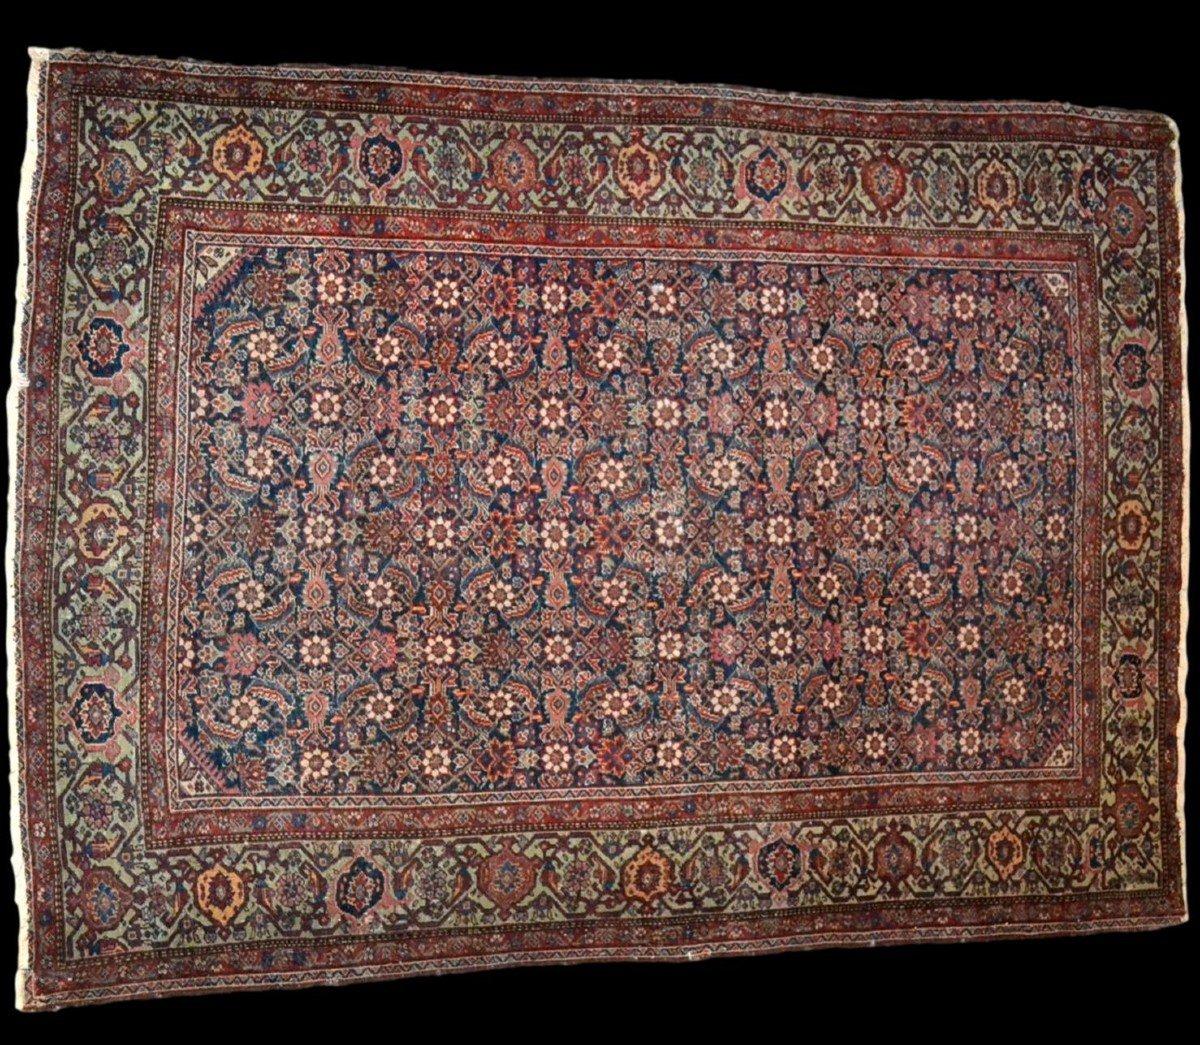 Tapis Persan Feraghan ancien, 131 cm x 185 cm, Iran, XIXème siècle, bel état collection-photo-2